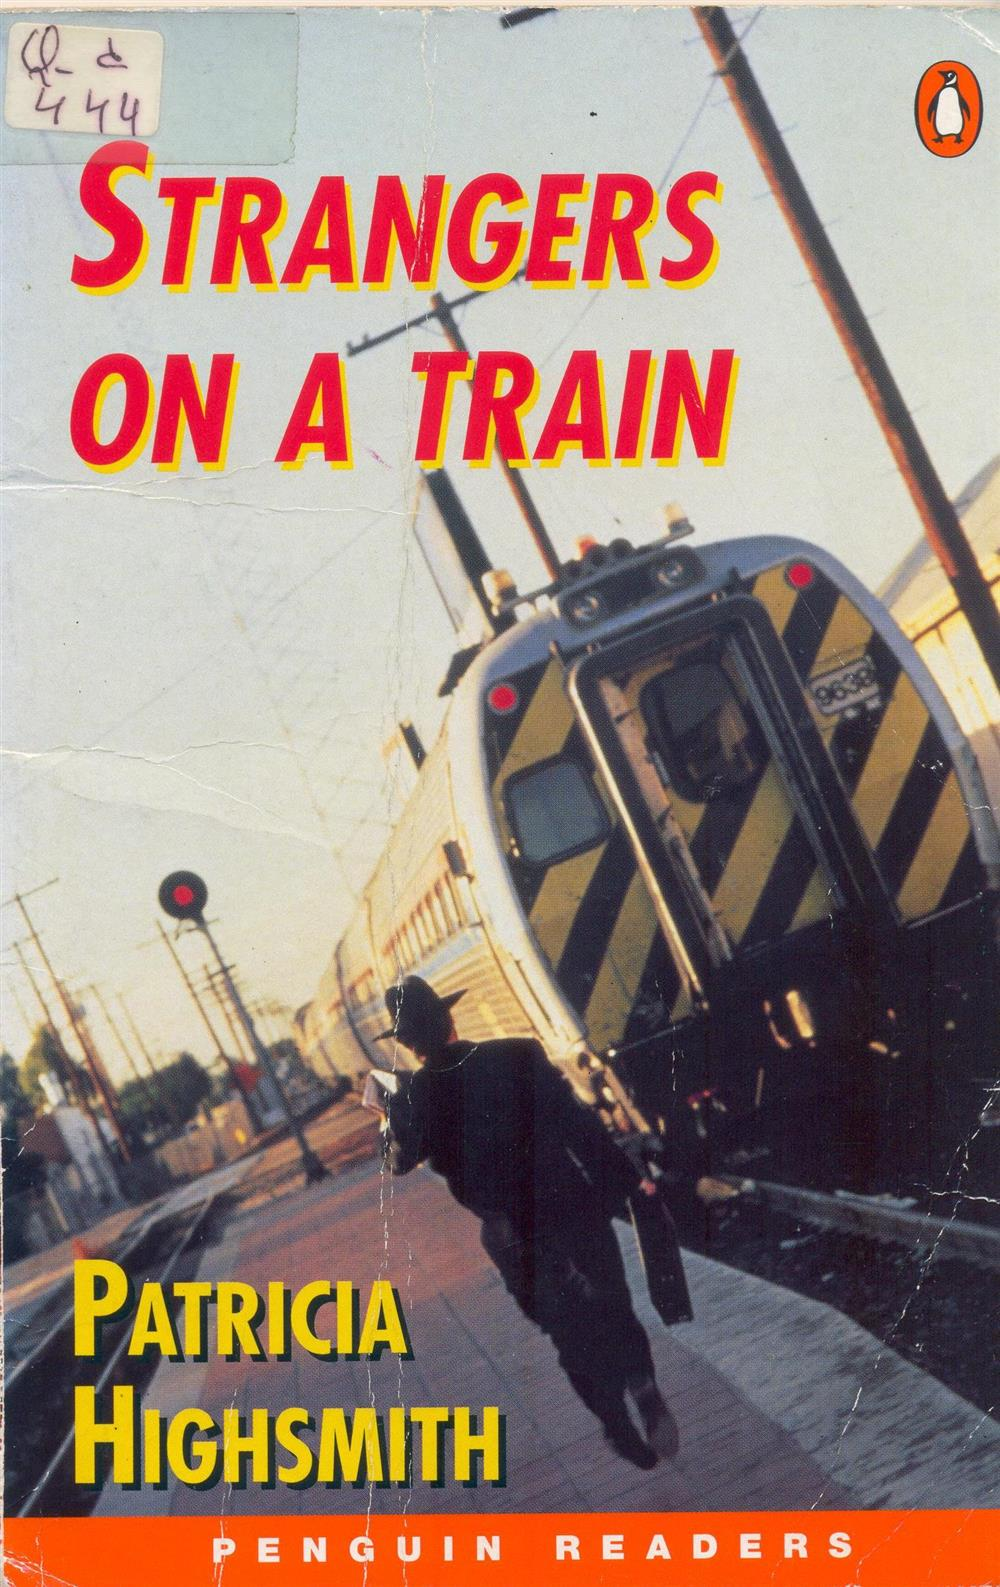 Strangers on a train 001.jpg